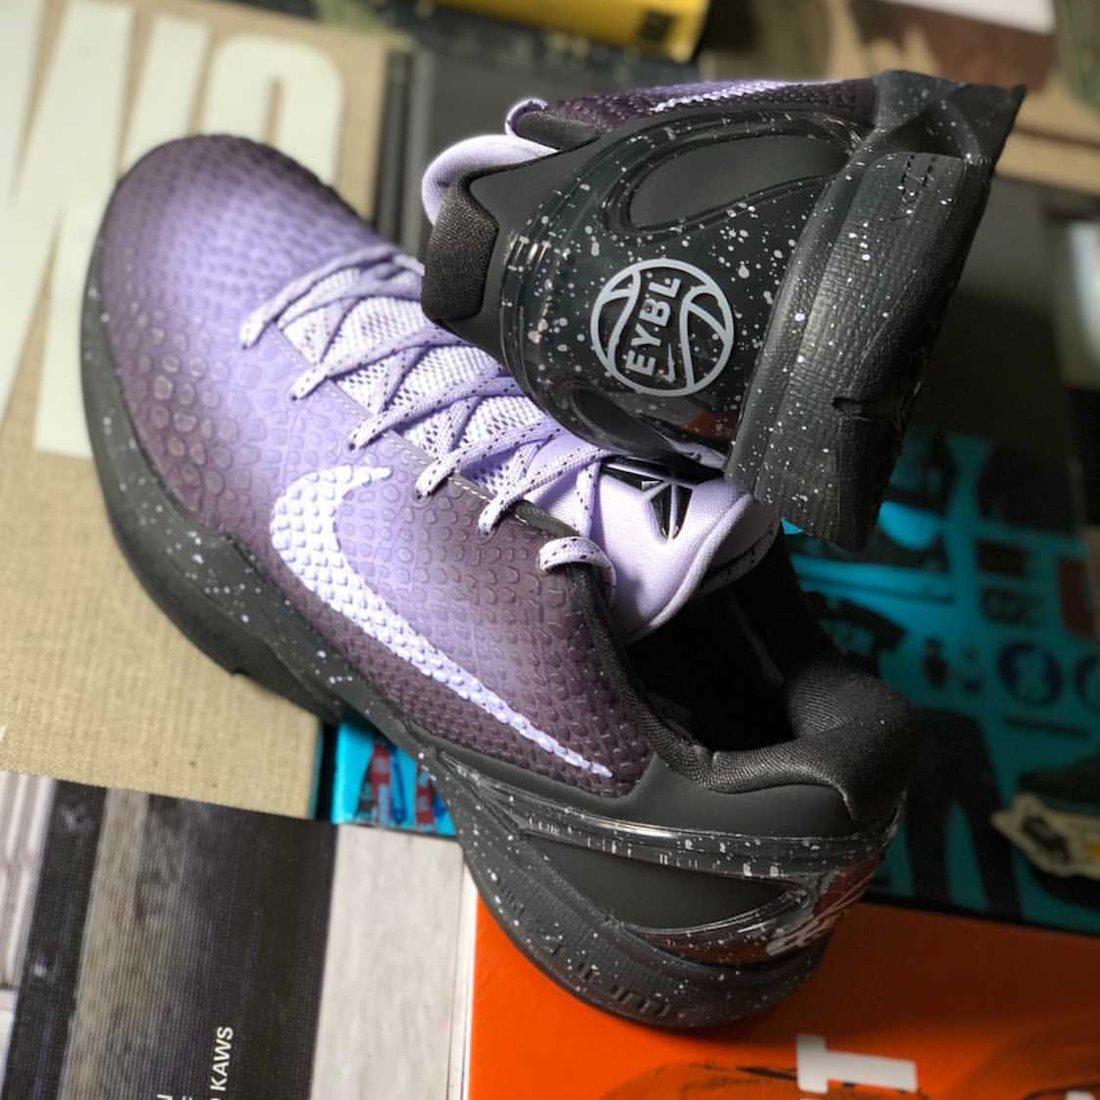 Nike Kobe 6 Protro EYBL Release Date Info